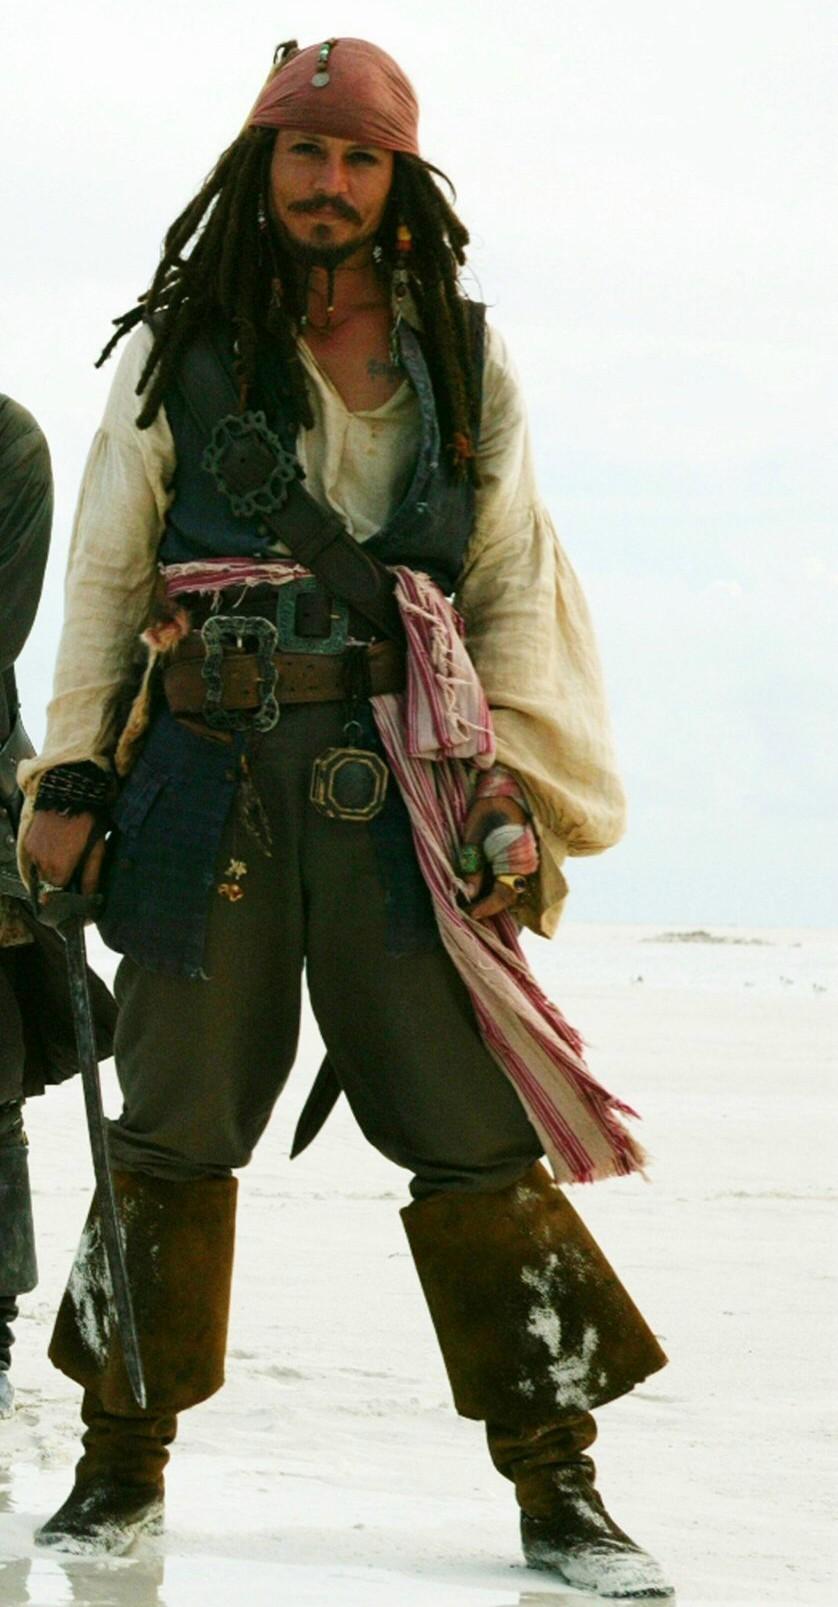 Captain Jack Sparrow images Captain Jack HD wallpaper and background